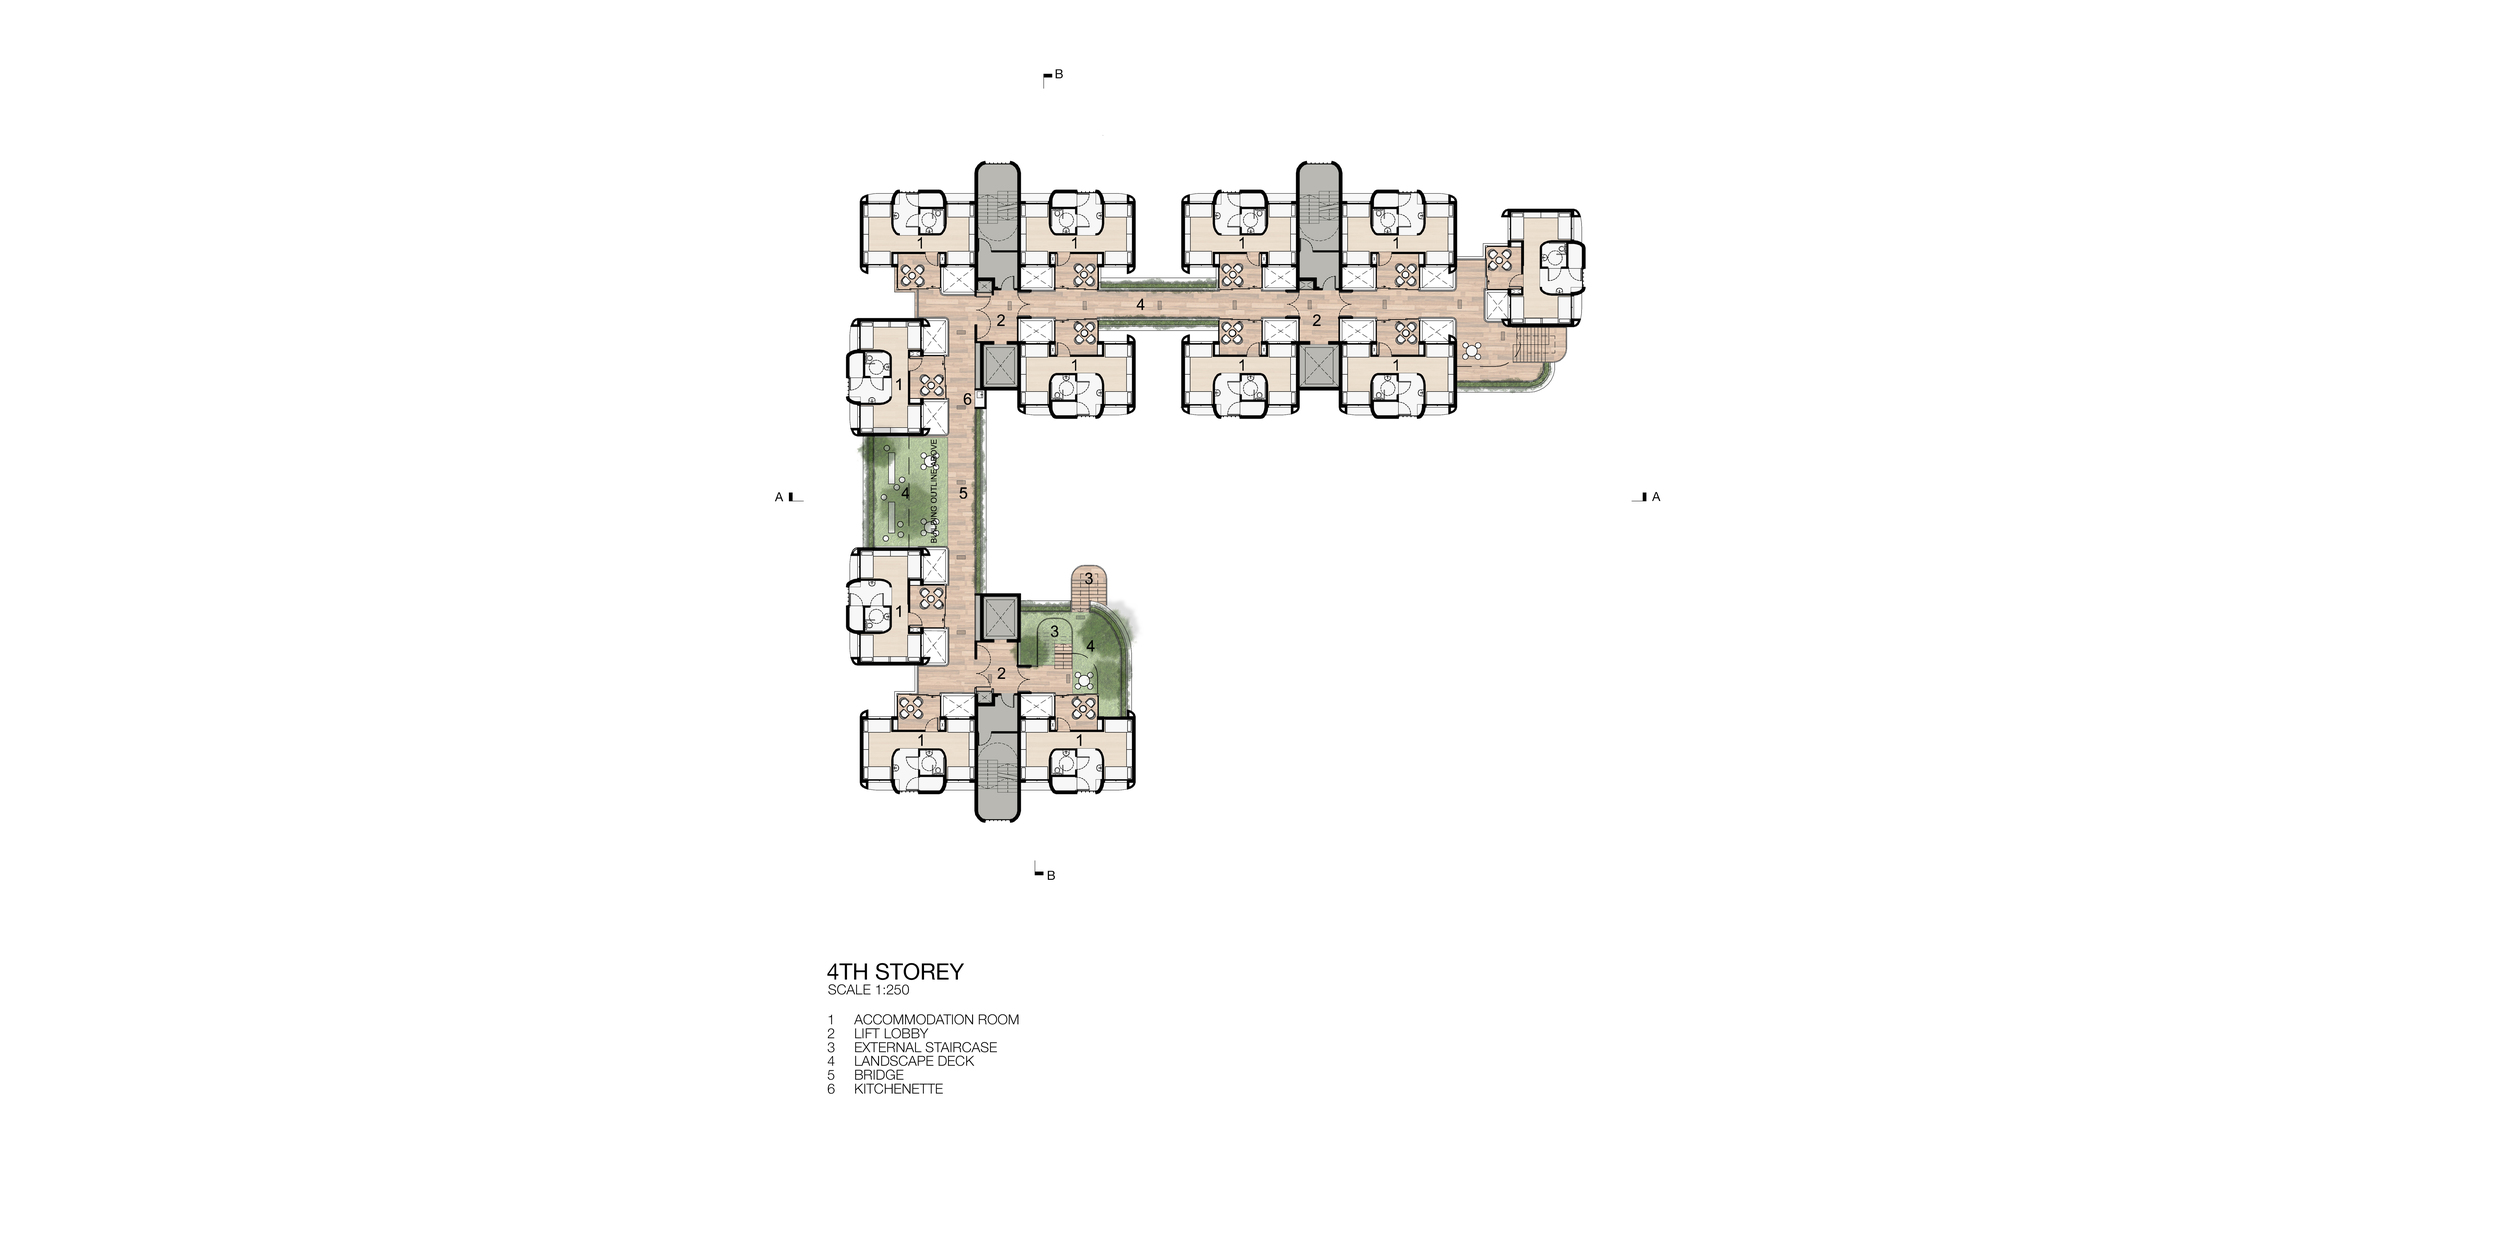 plan_level 4.jpg